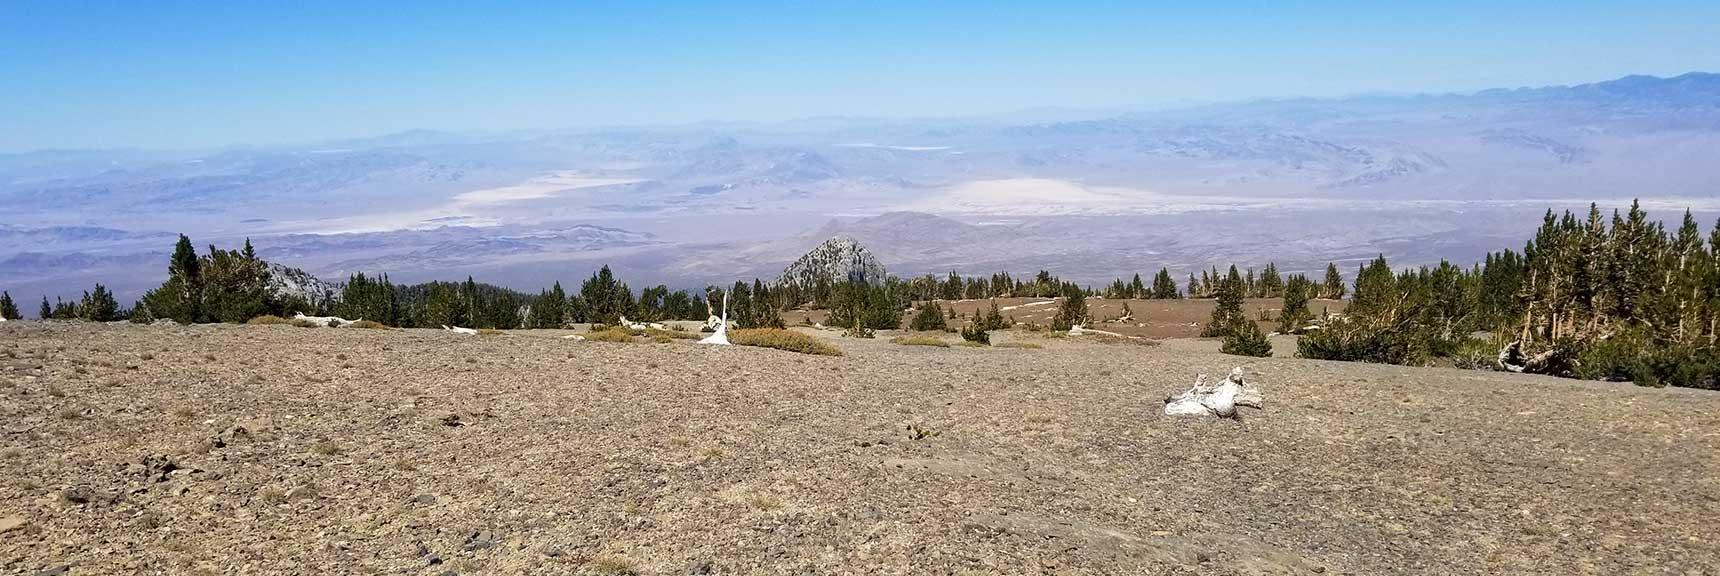 Walk Toward the Northern Edge of Mummy Mt. Summit, Nevada